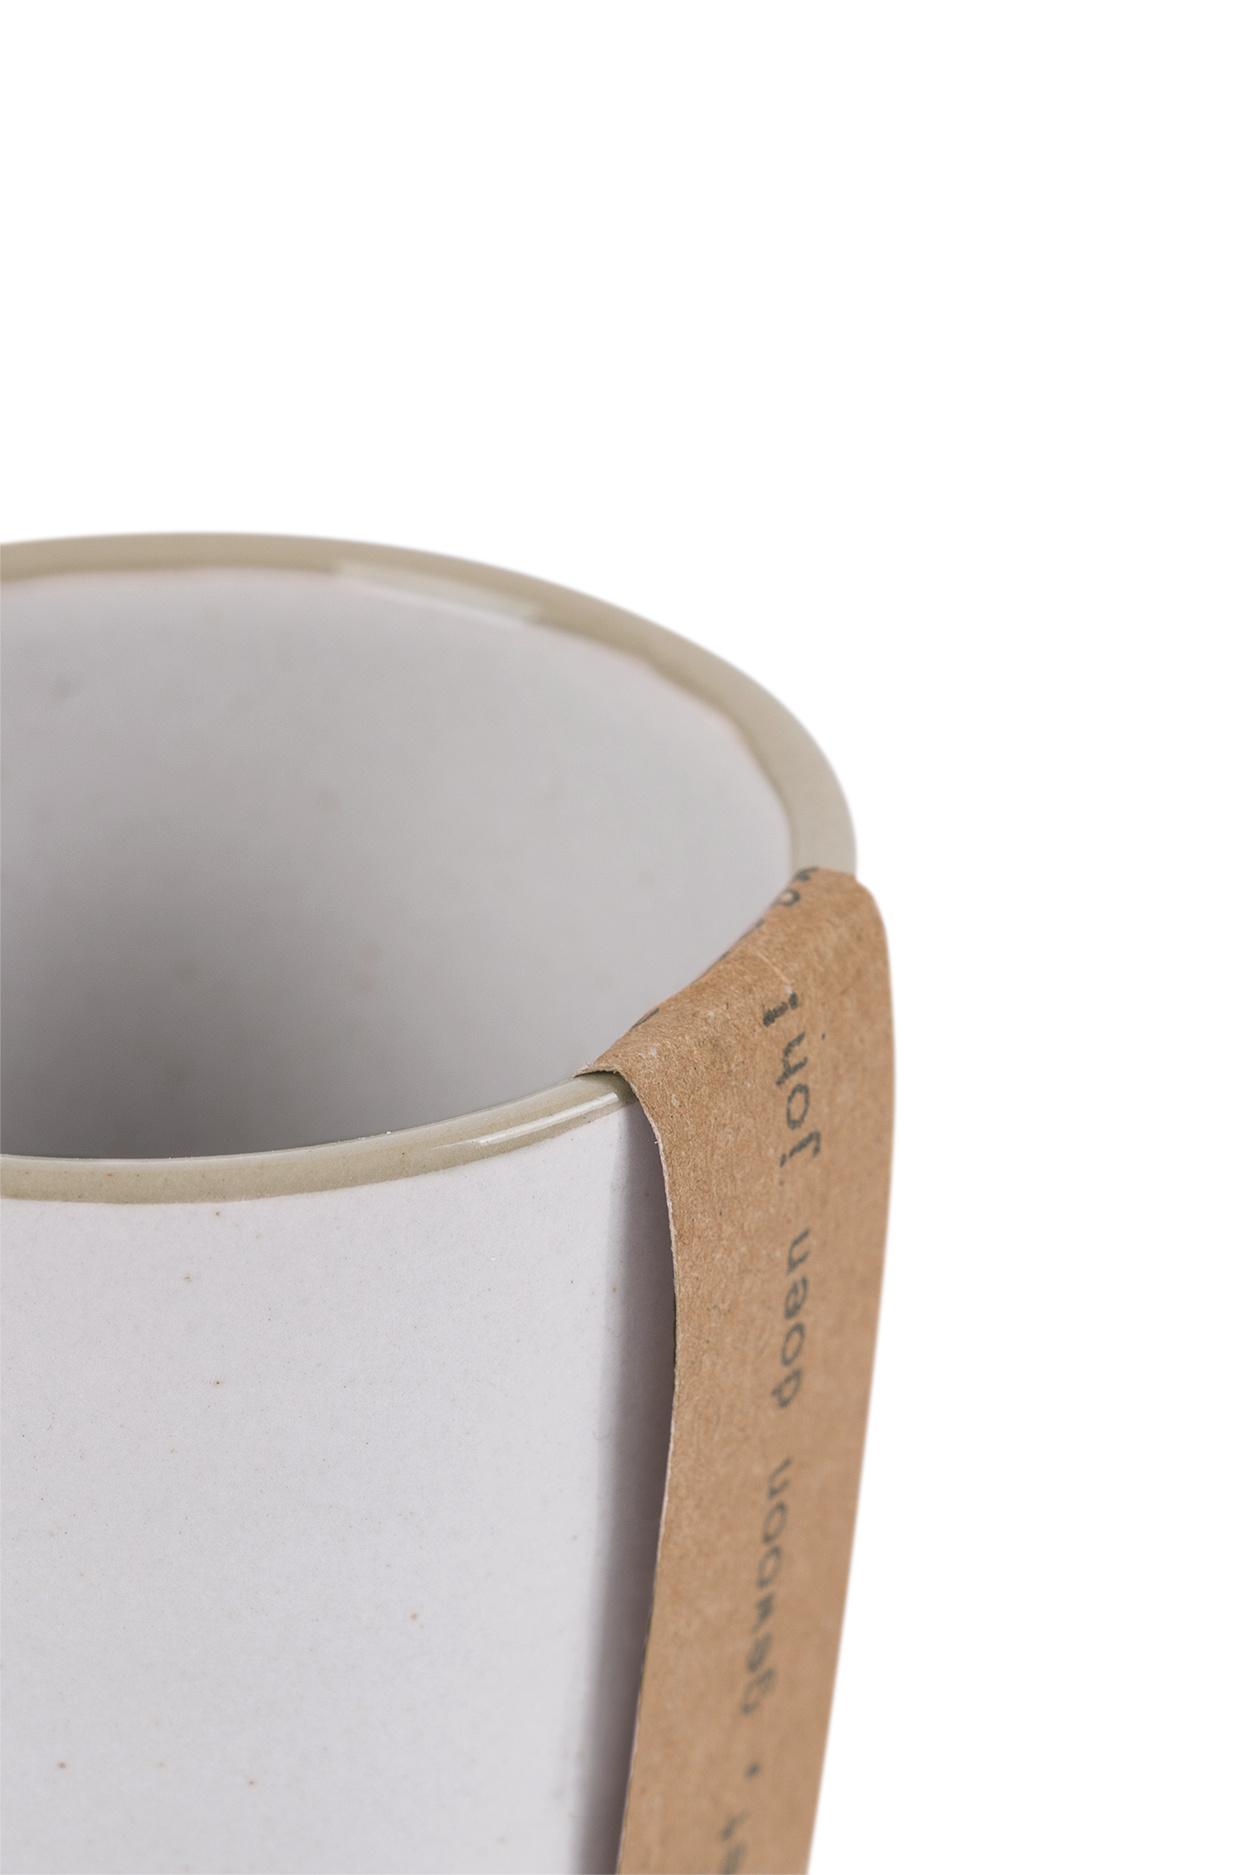 Zusss Espresso kopje aardewerk -  wit